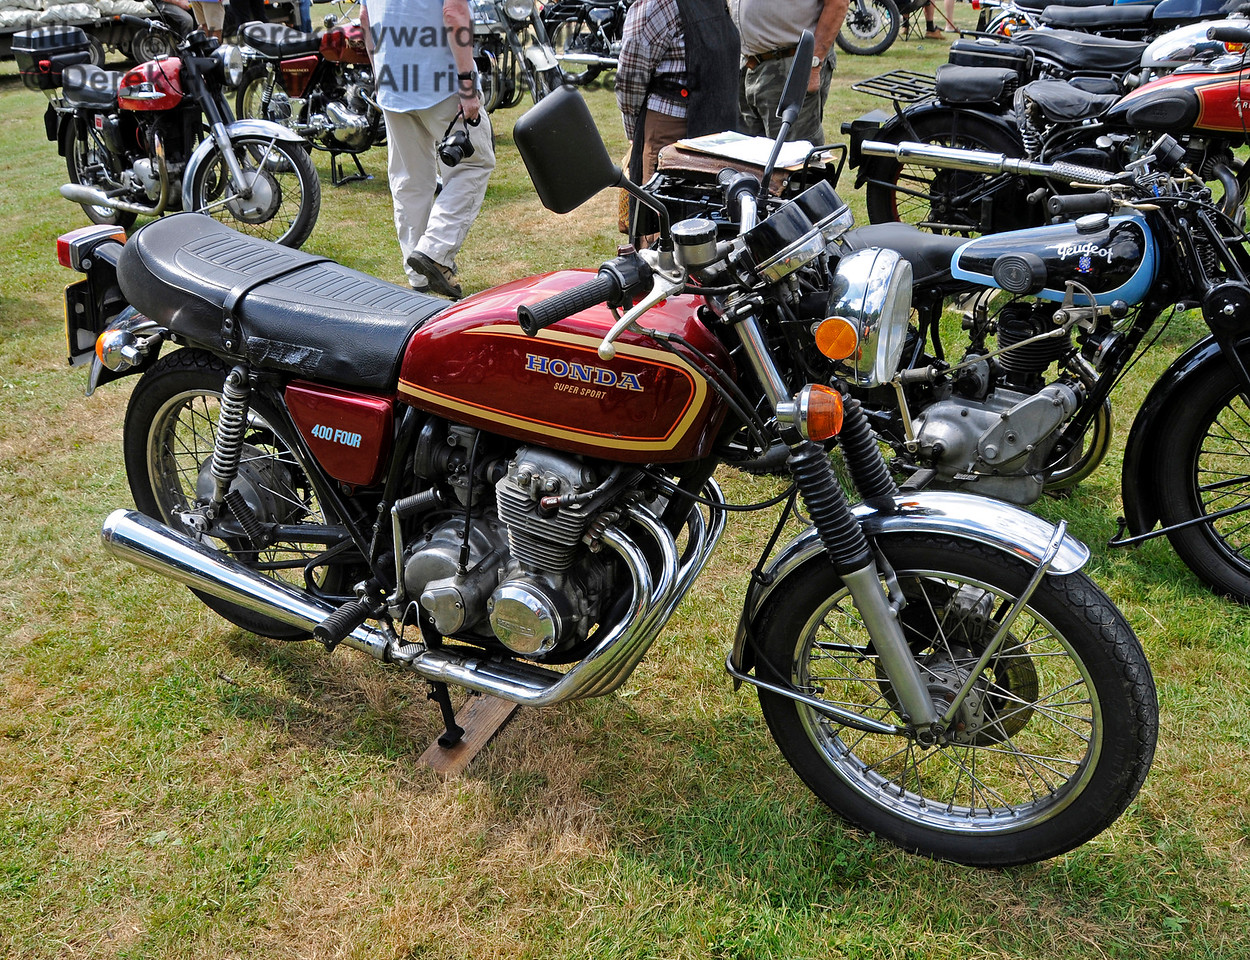 Best Motor Cycle in the Post-War category was a Honda CB 400/4, JBY3N, owned by Alan George.  Vintage Transport Weekend, Horsted Keynes, 14.08.2016  16178